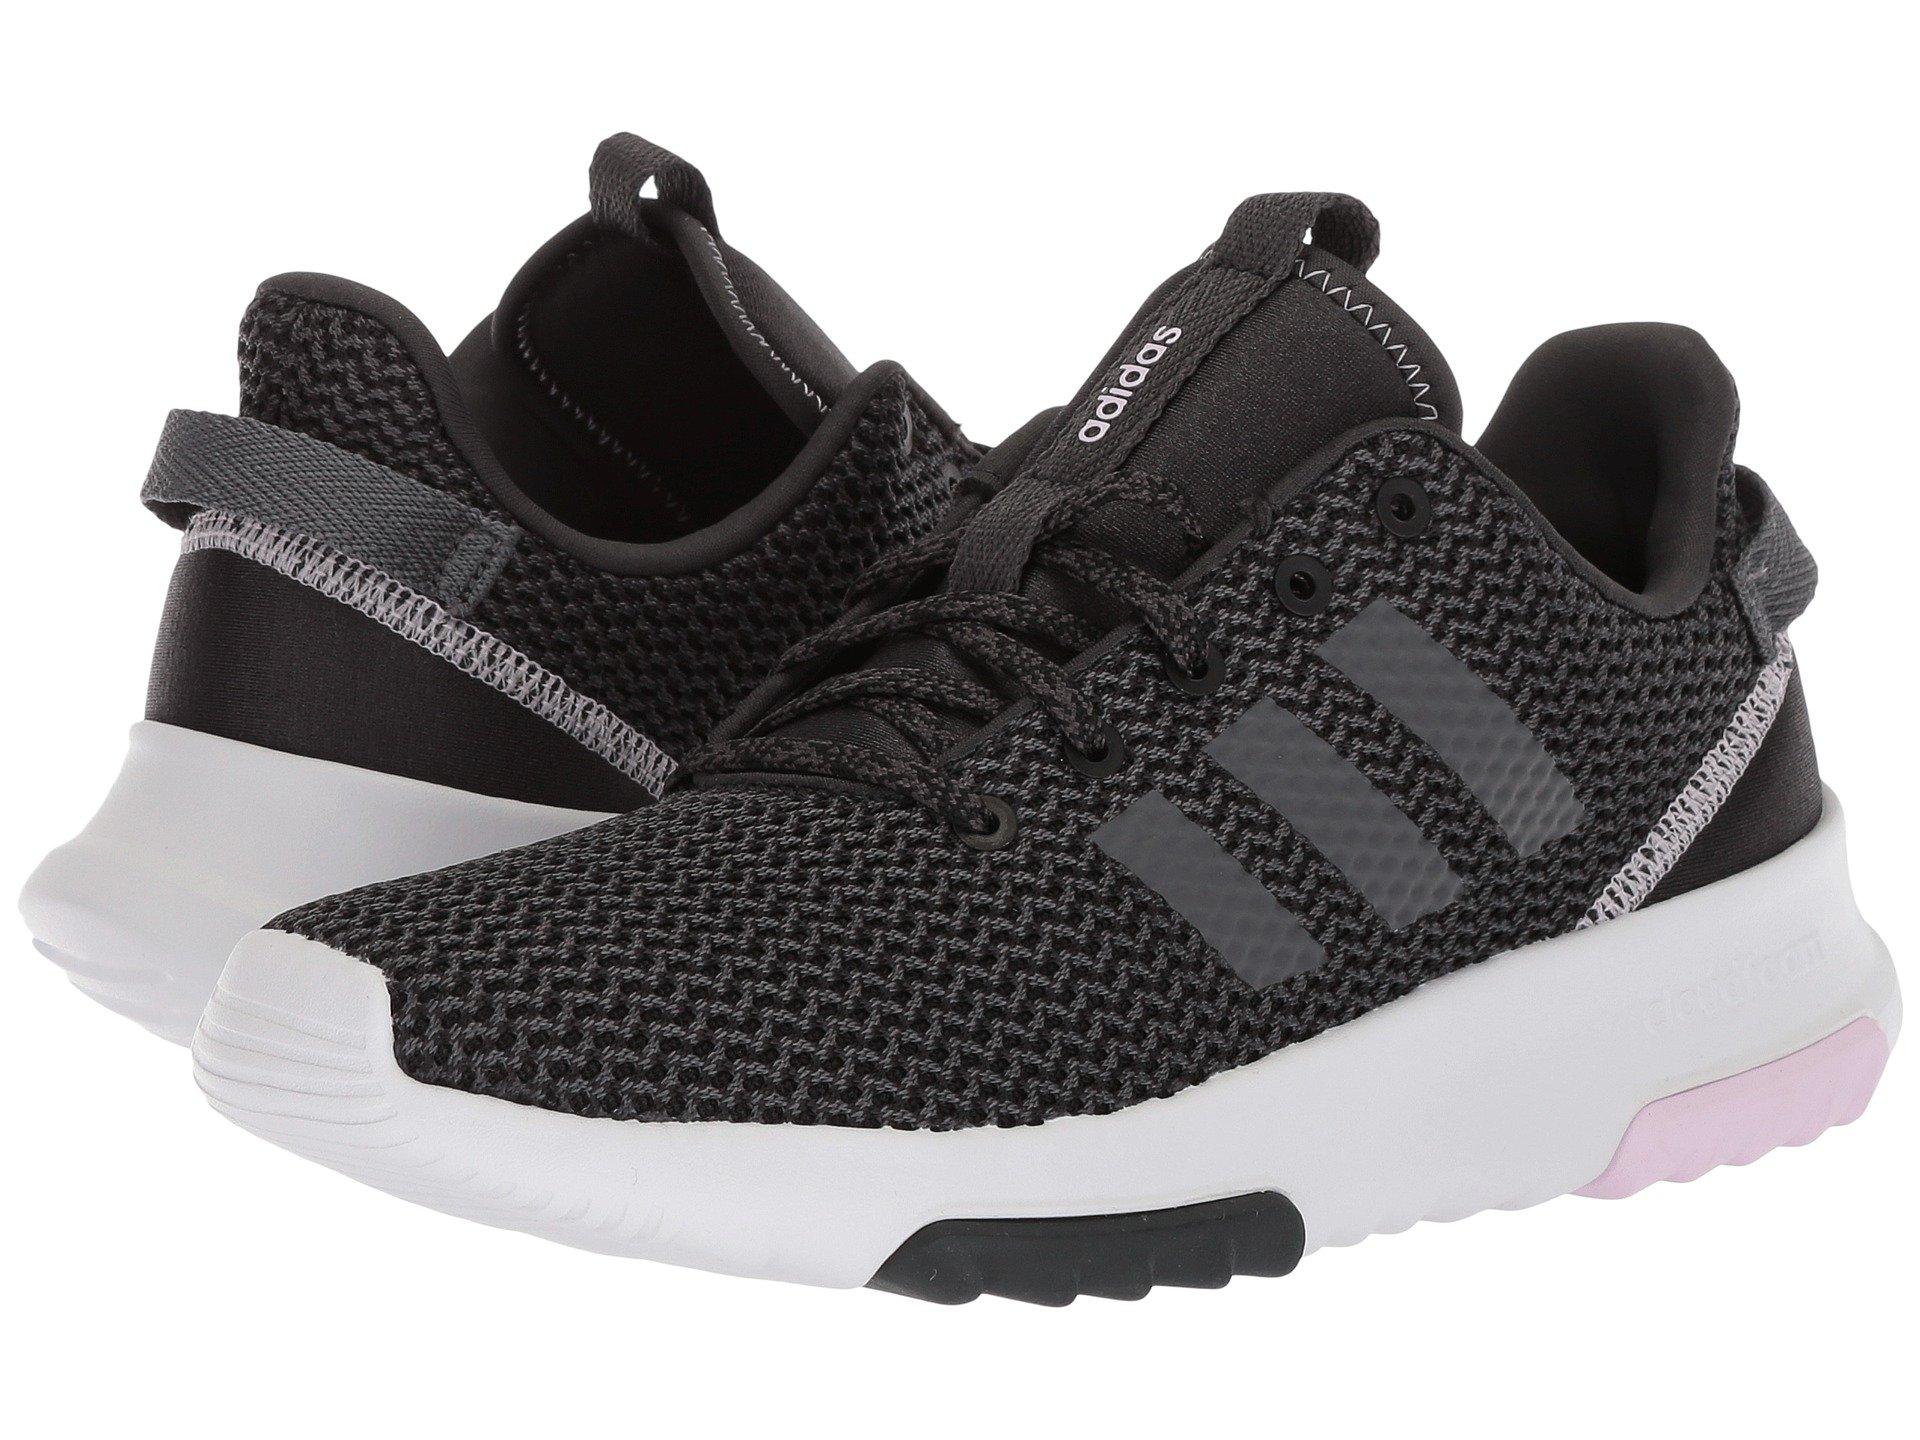 Adidas originali cloudfoam racer tr, carbonio / grigio 5 / aero modesens rosa